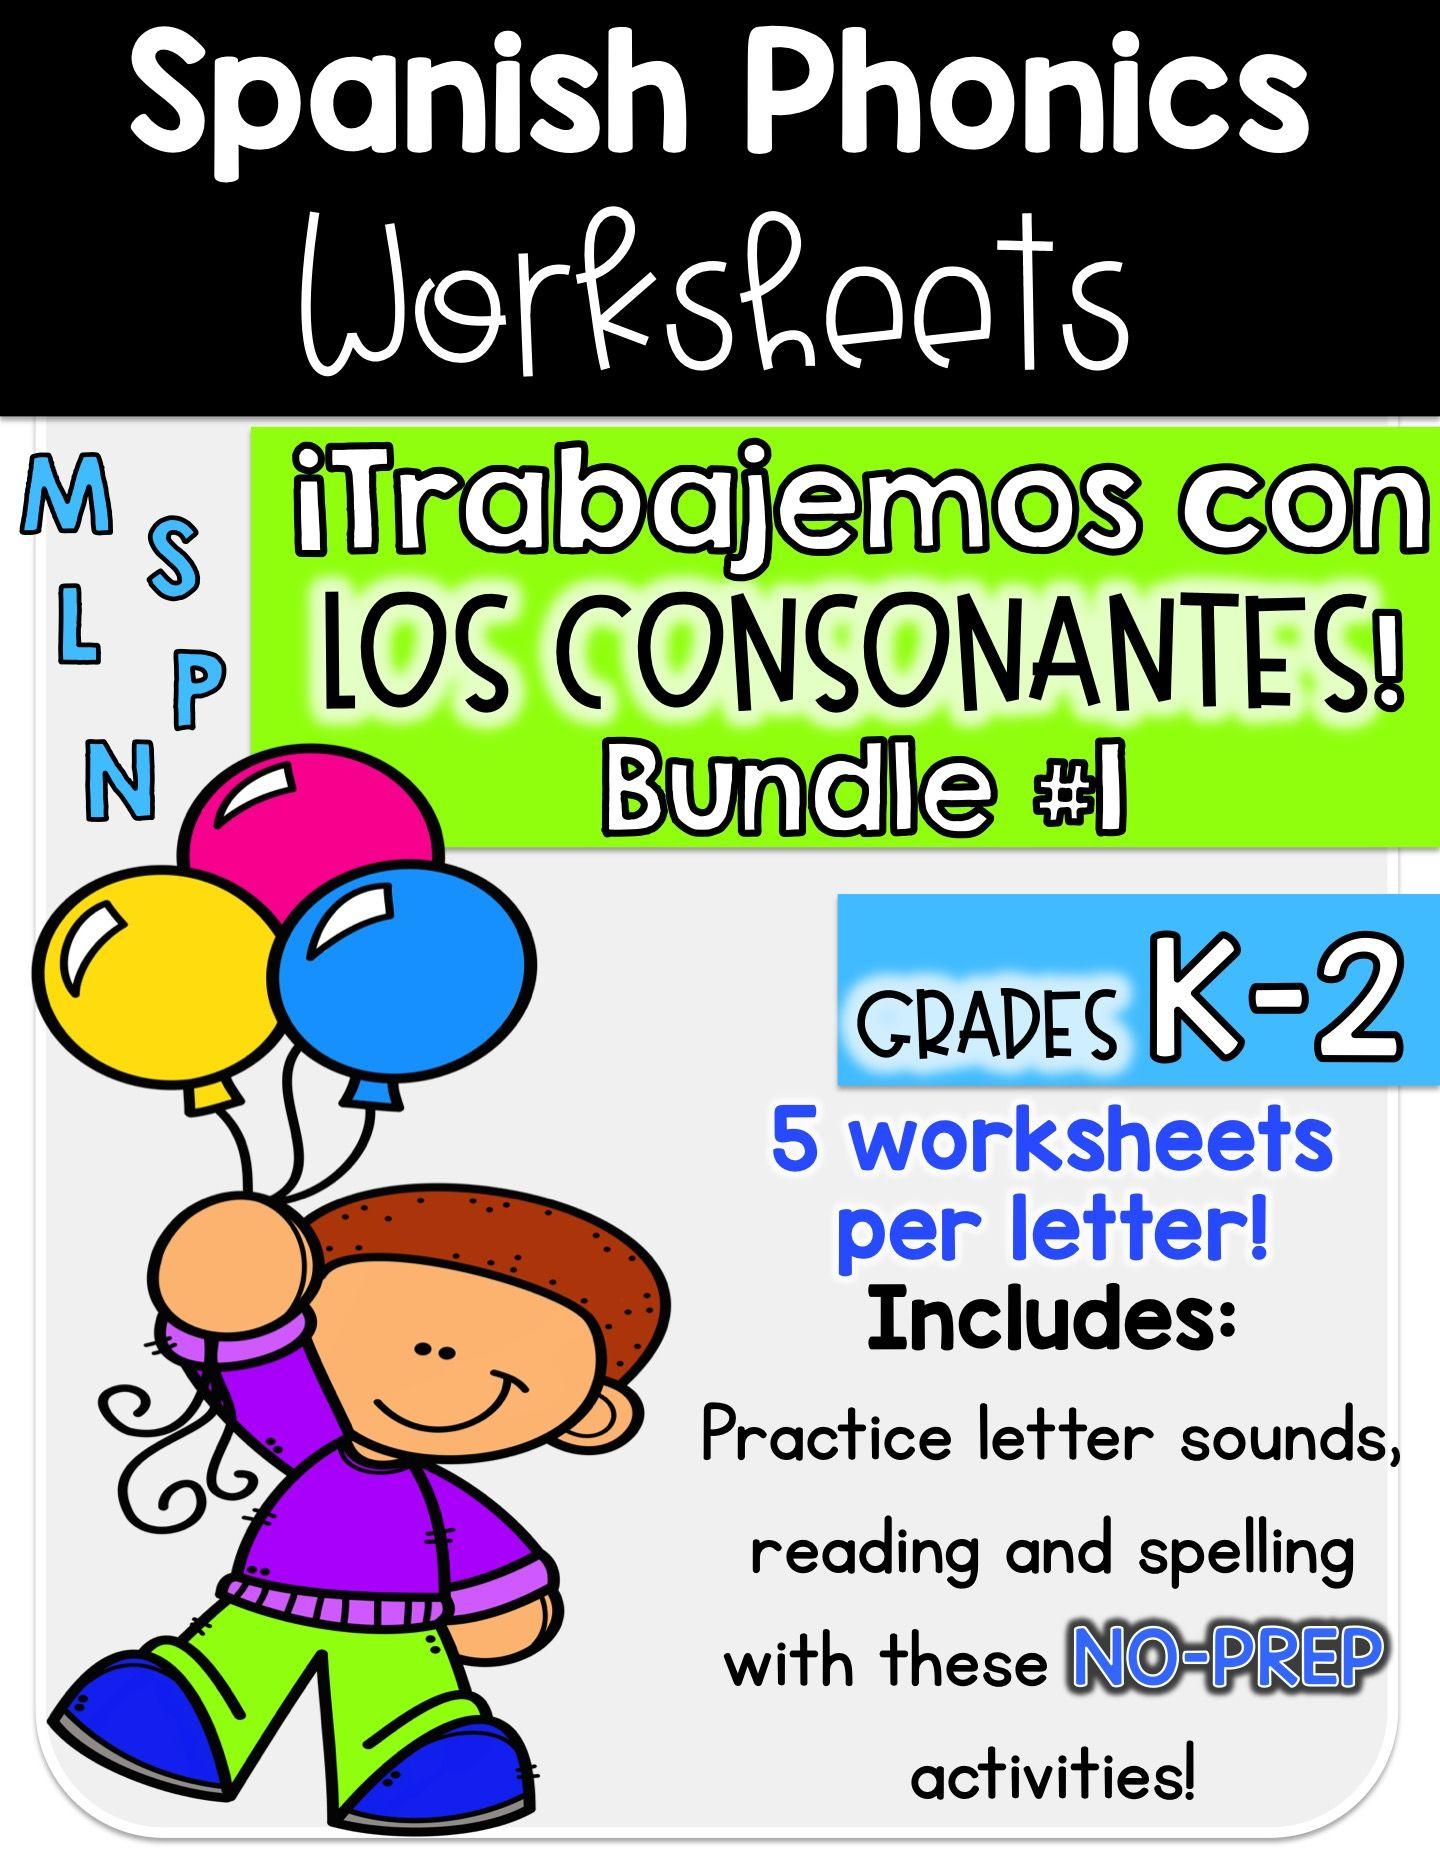 Spanish Phonics Trabajemos Con Las Consonantes Bundle 1